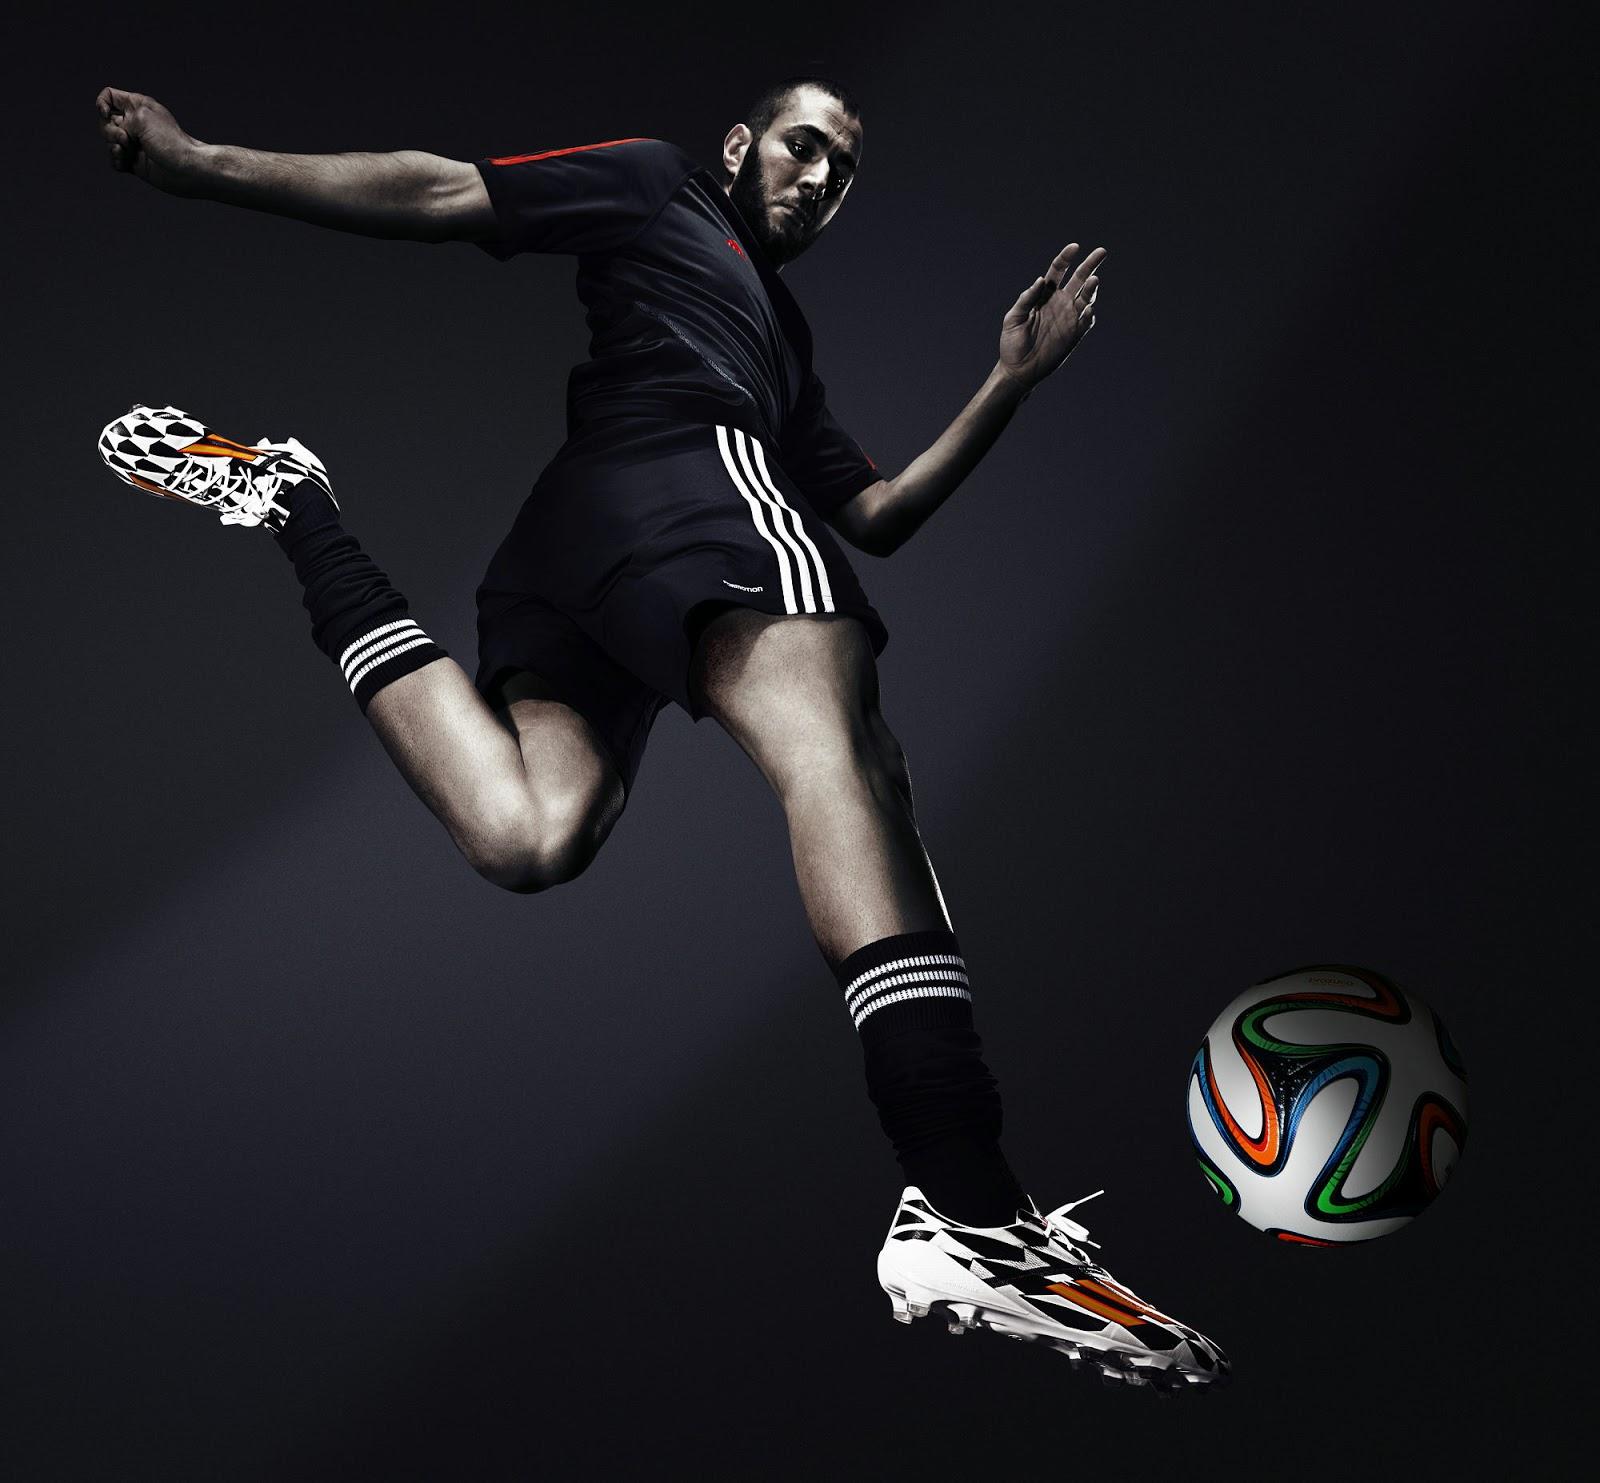 adidas adizero f50 battle pack